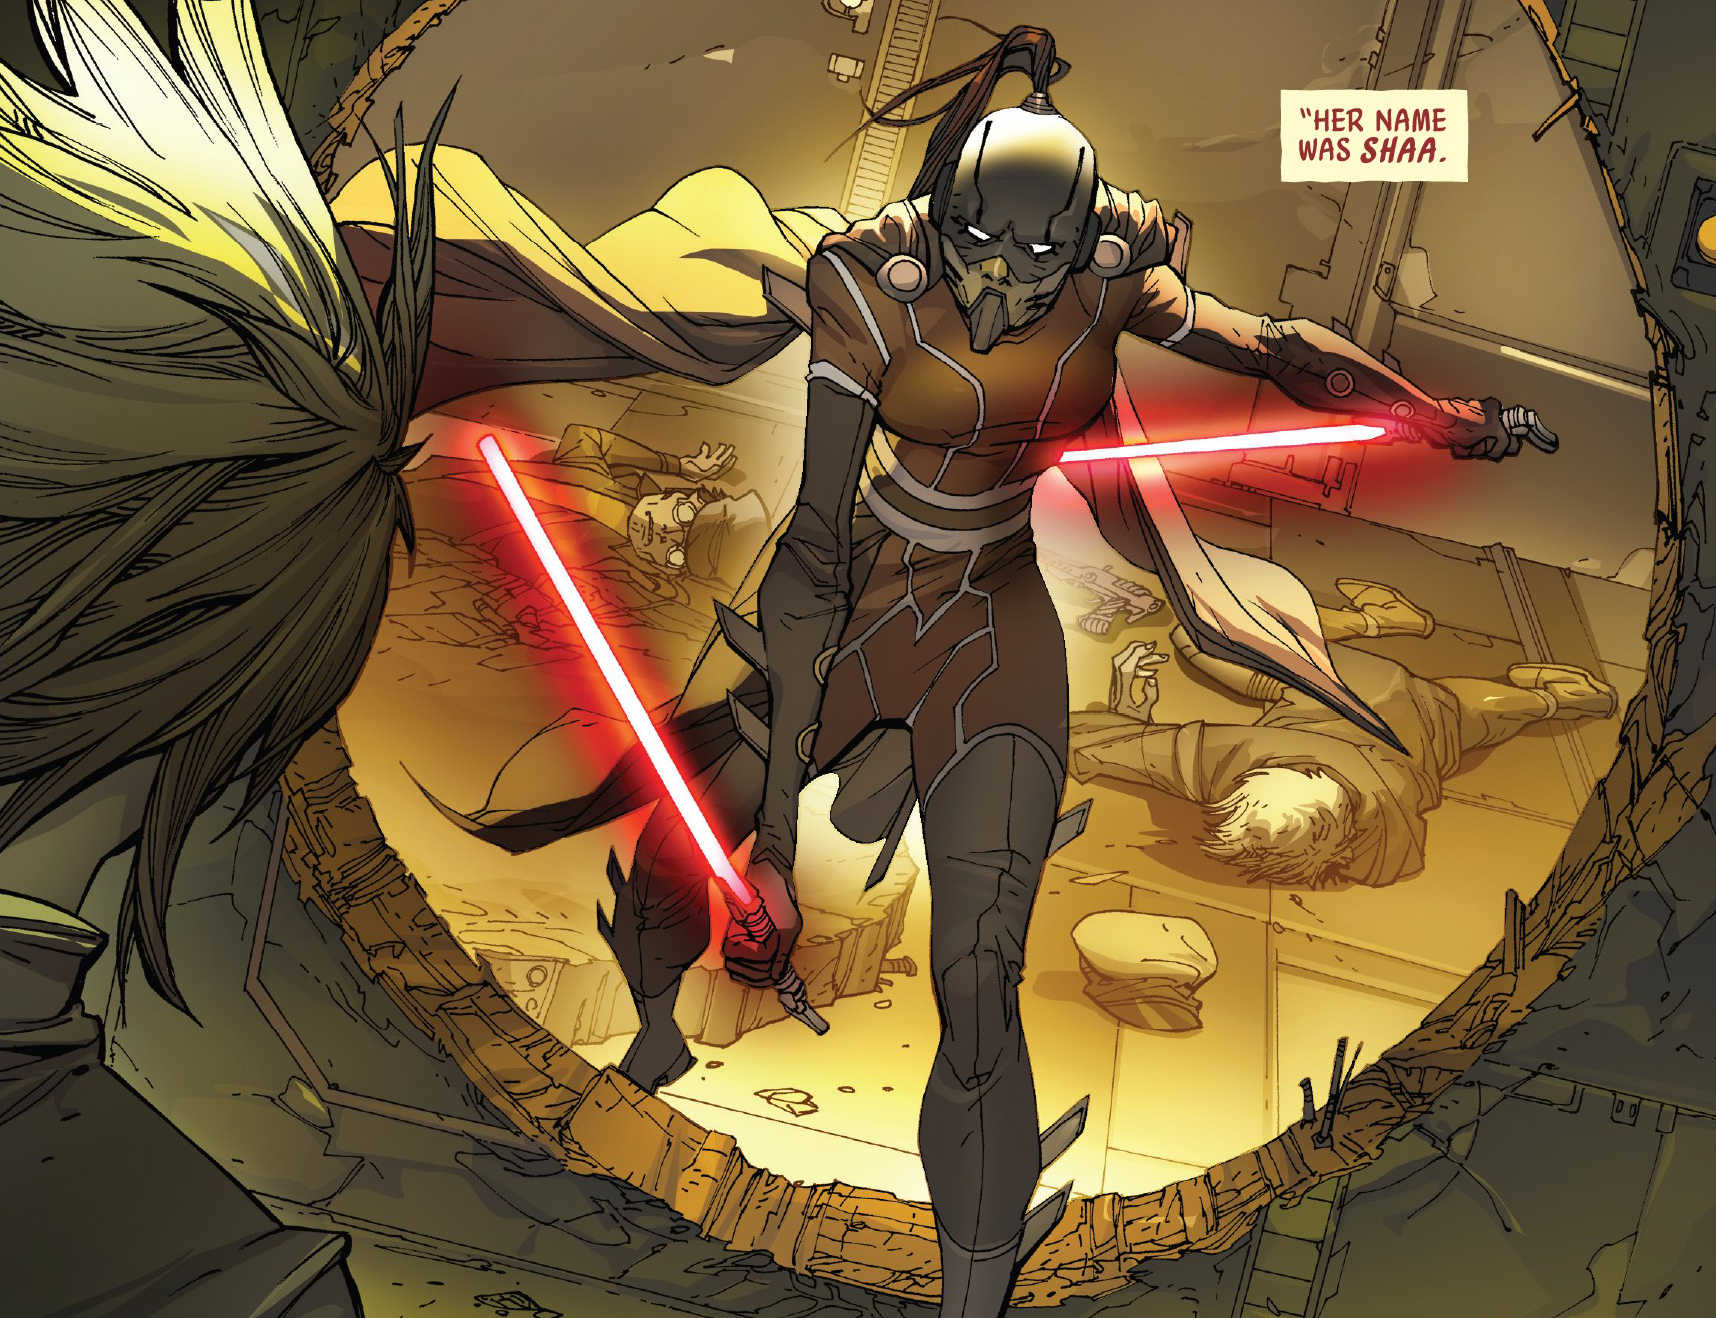 Darth Shaa's lightsabers